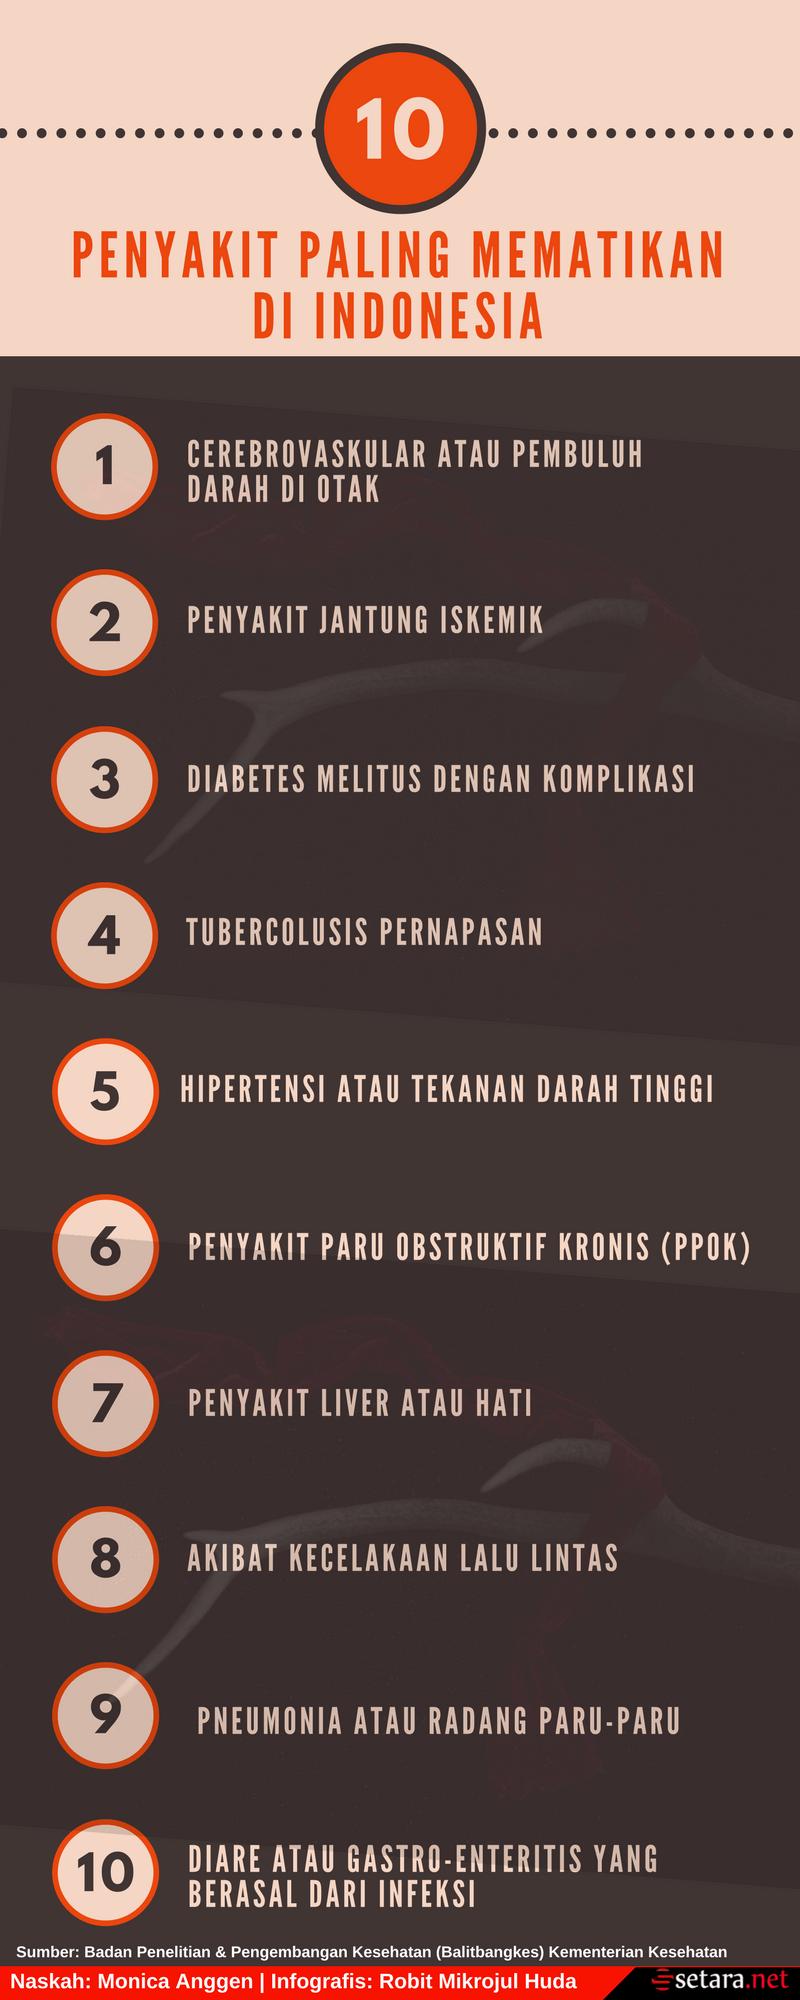 10 Penyakit Paling Mematikan di Indonesia (2)